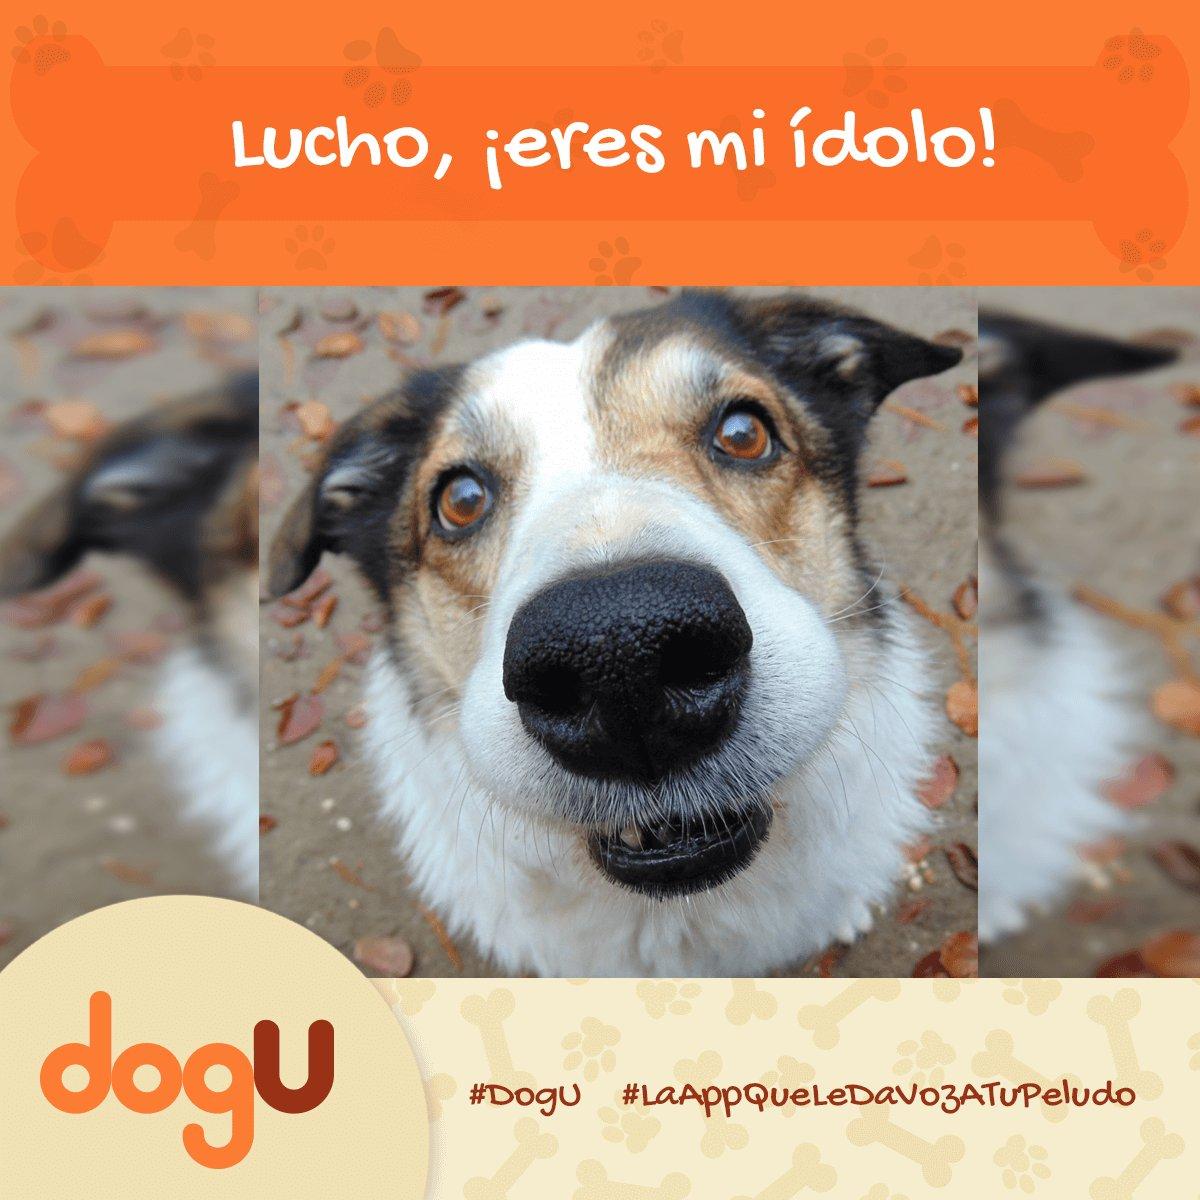 Sé la persona que tu perro cree que eres. #YoSoyUnDogULover #DogU #LaAppQueLeDaVozATuPeludo #DescárgalaYa https://t.co/DkaRQn71rc https://t.co/AzaAevEOWQ